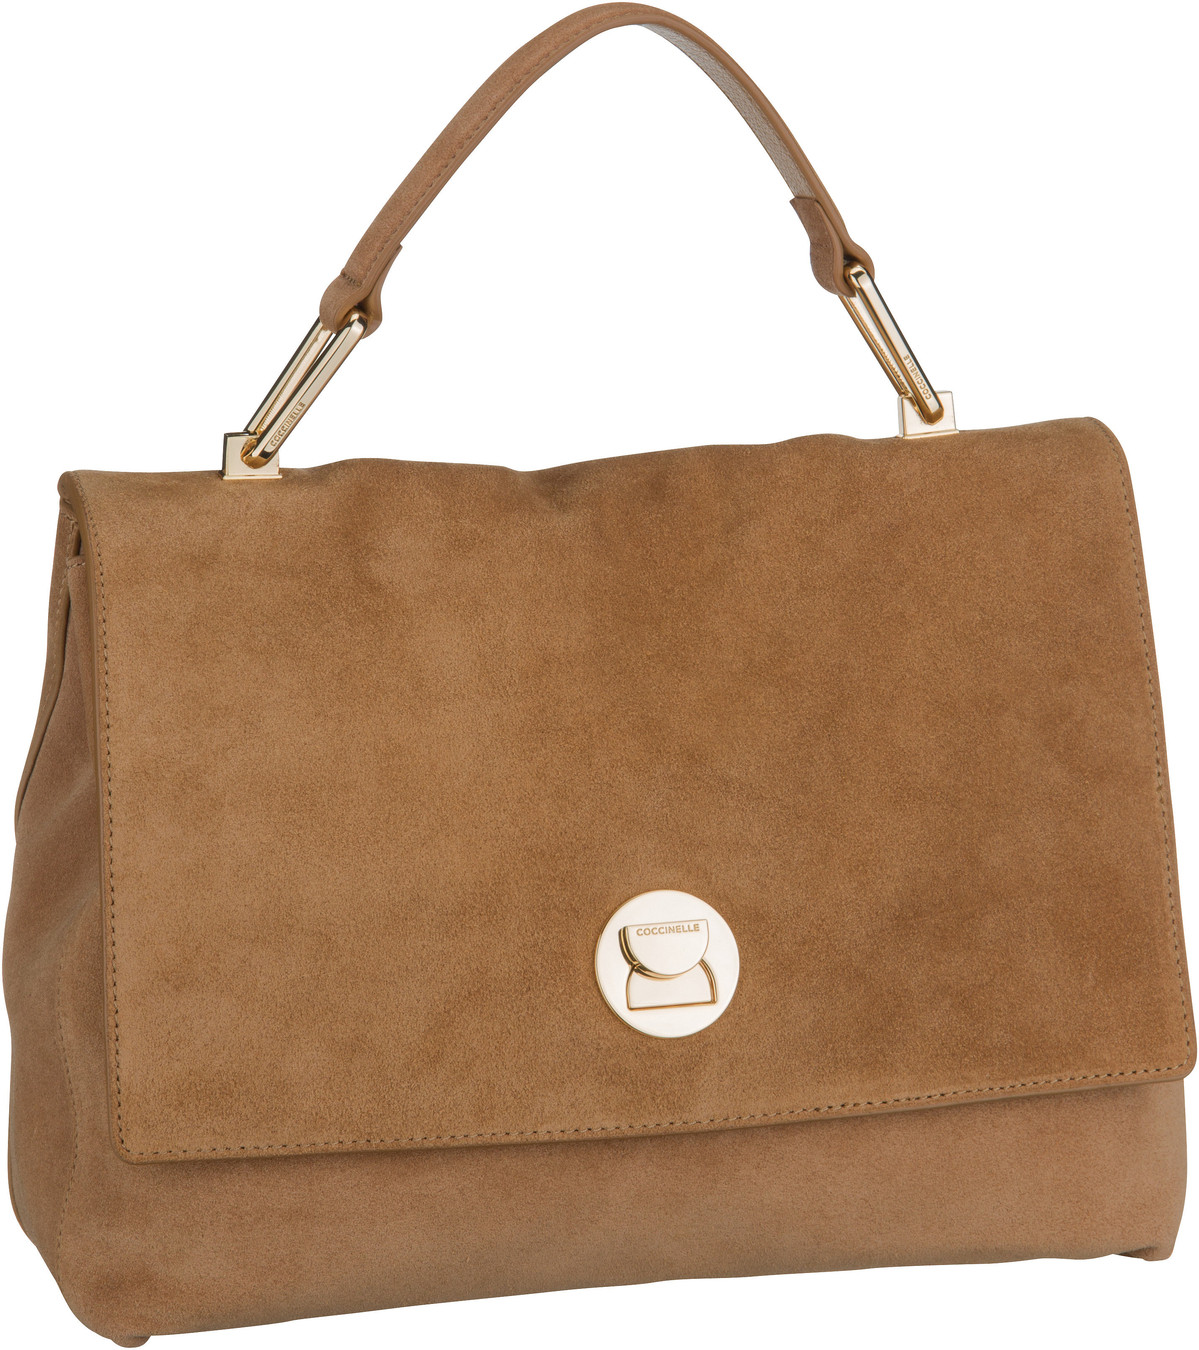 Handtasche Liya Suede 1801 Camel